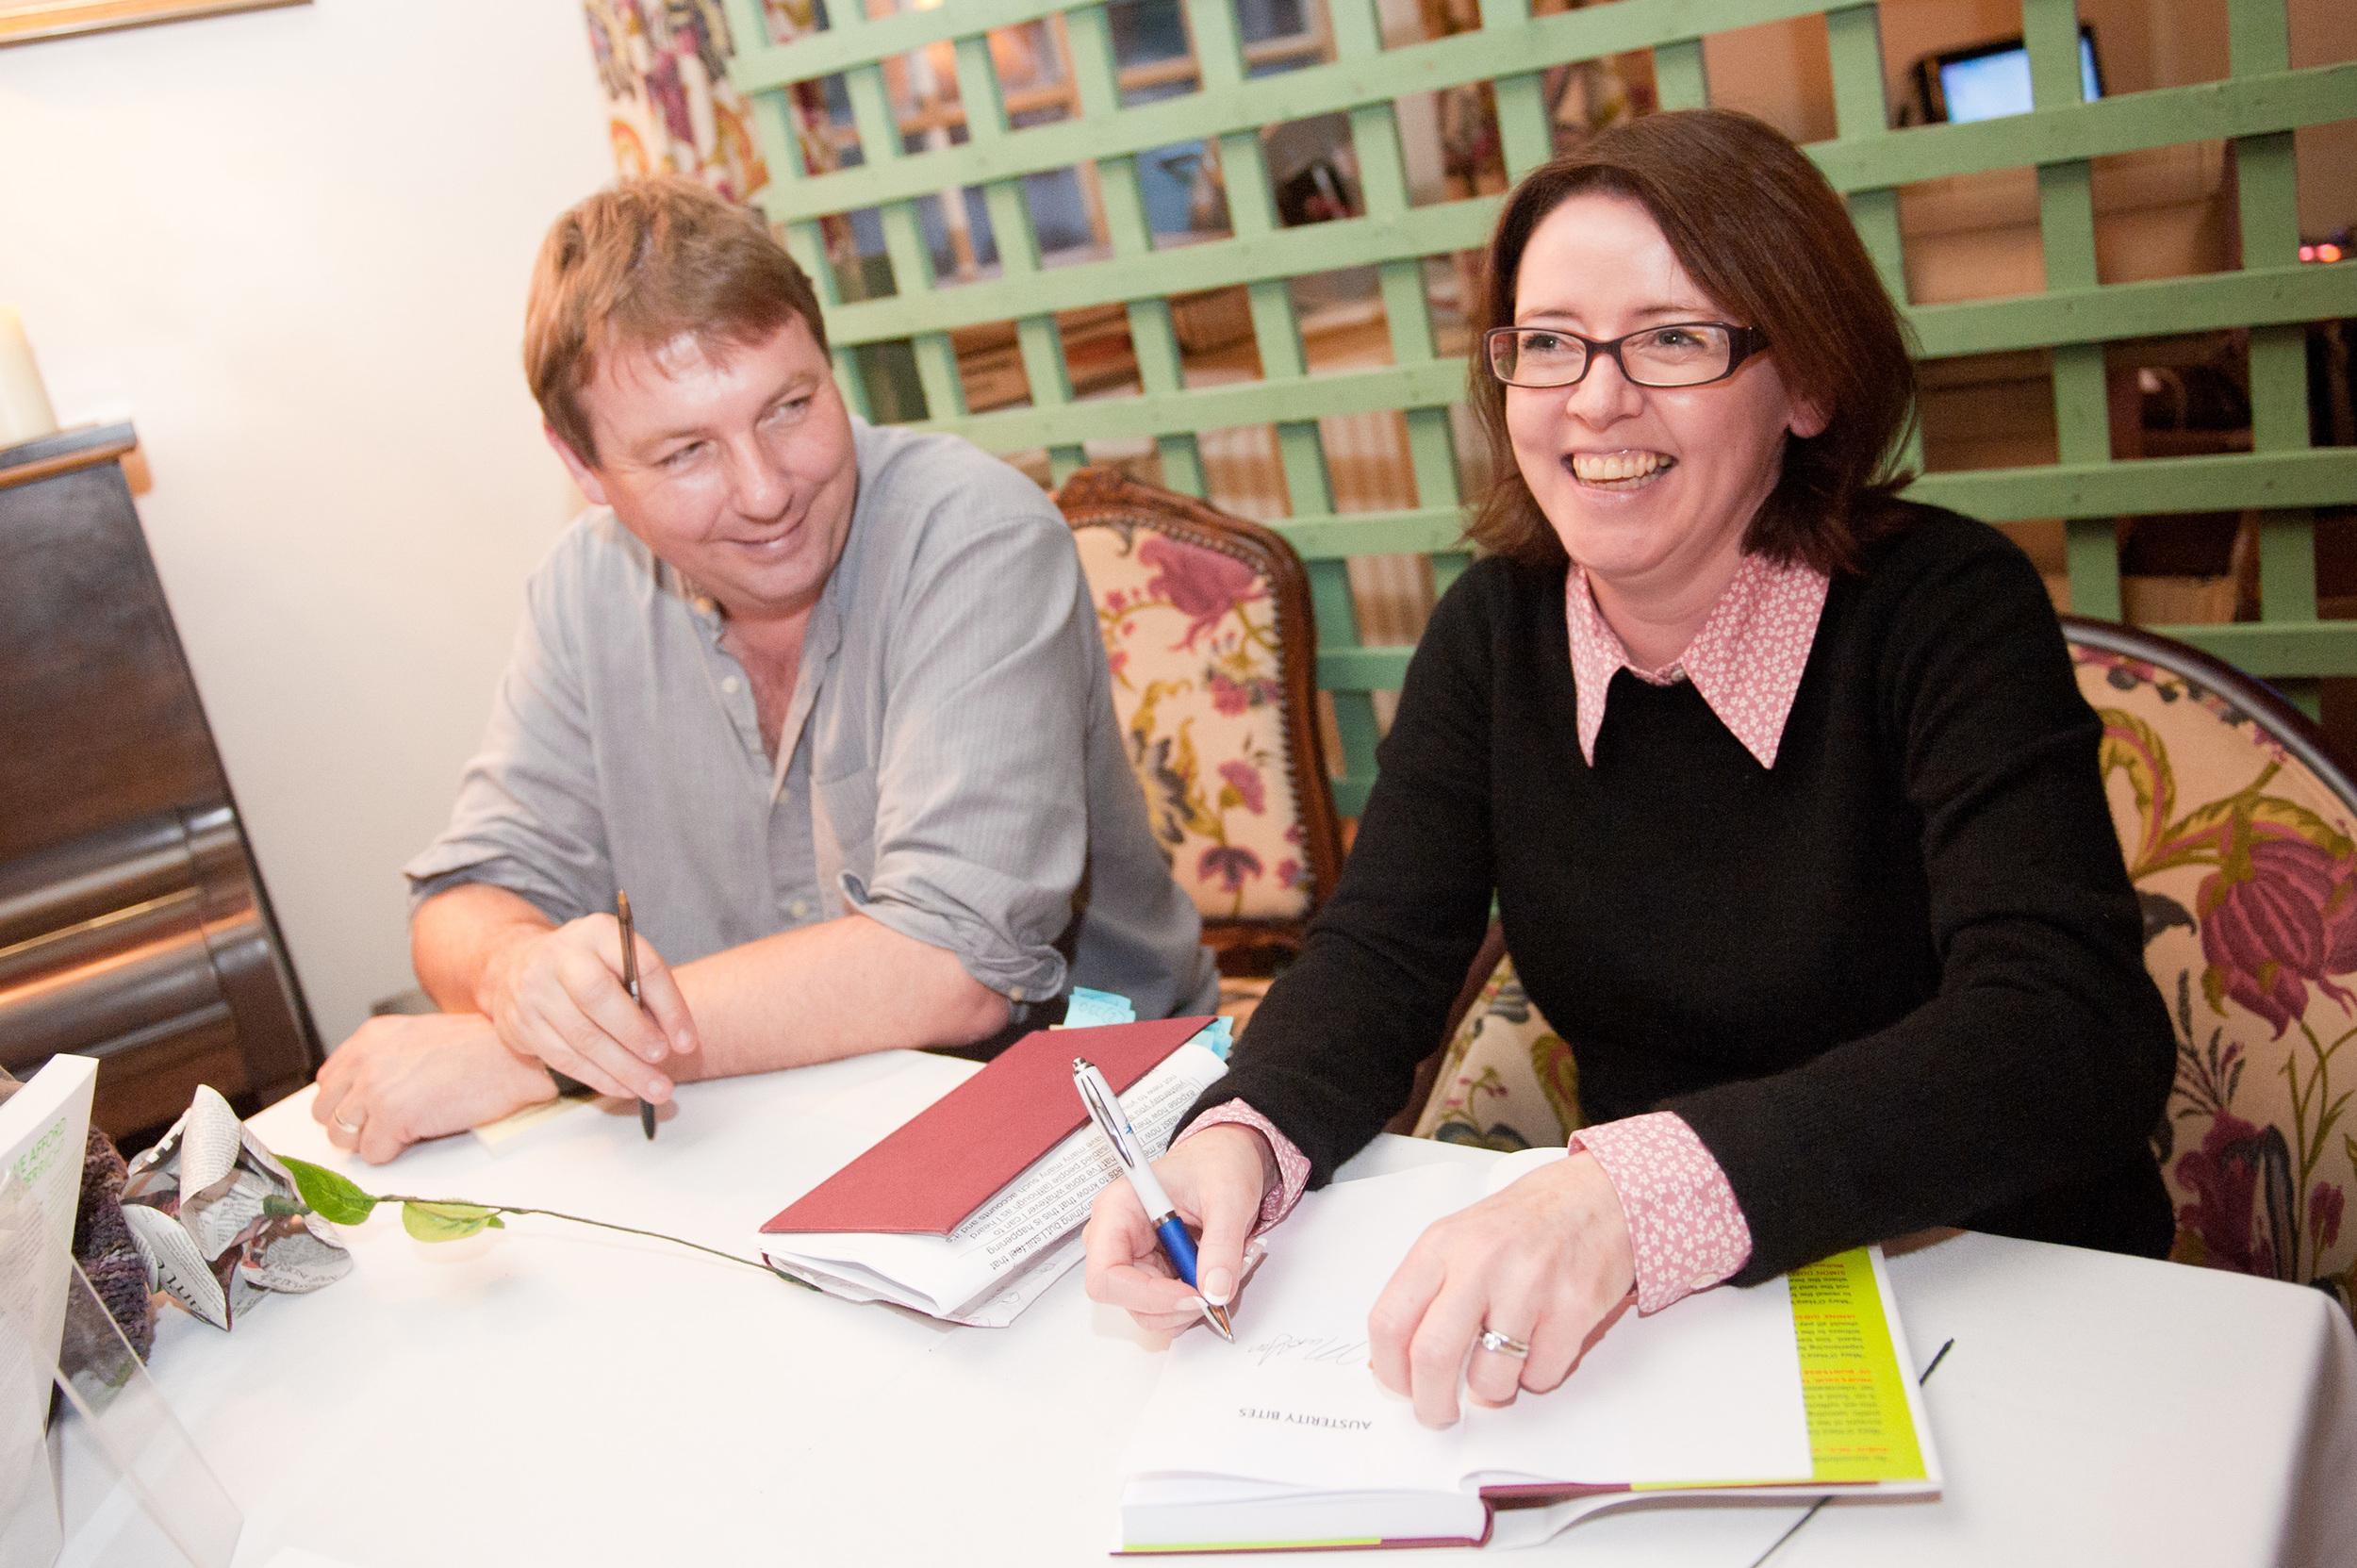 Danny Dorling and Mary O'Hara at the Hay Winter Festival 2014